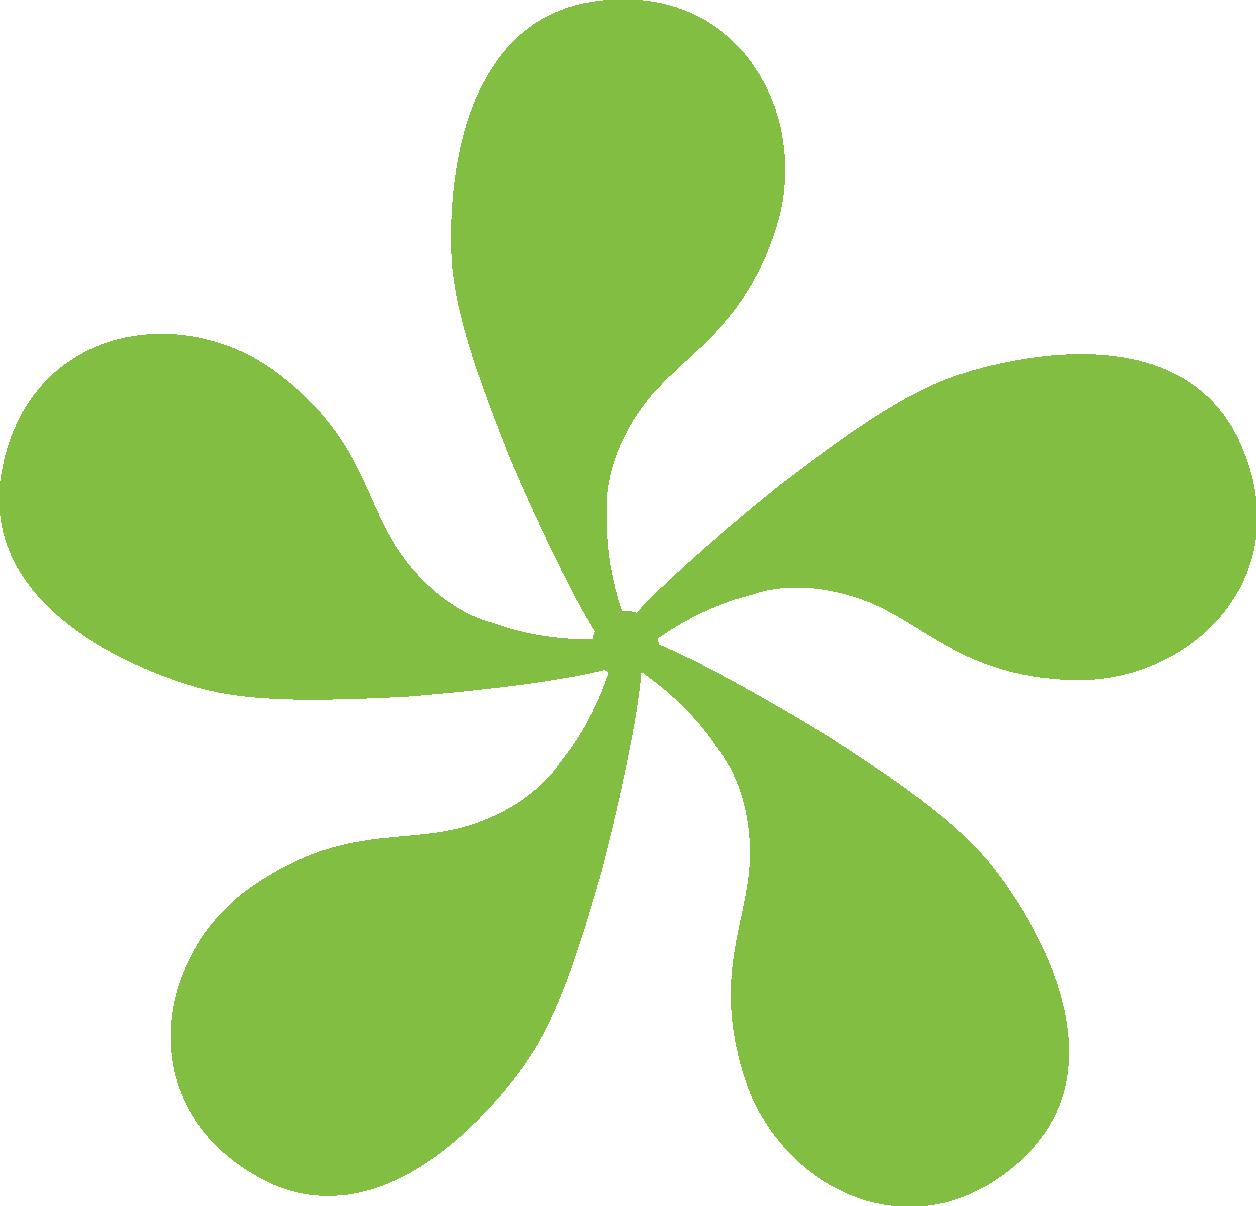 integrasoft Pinwheel icon